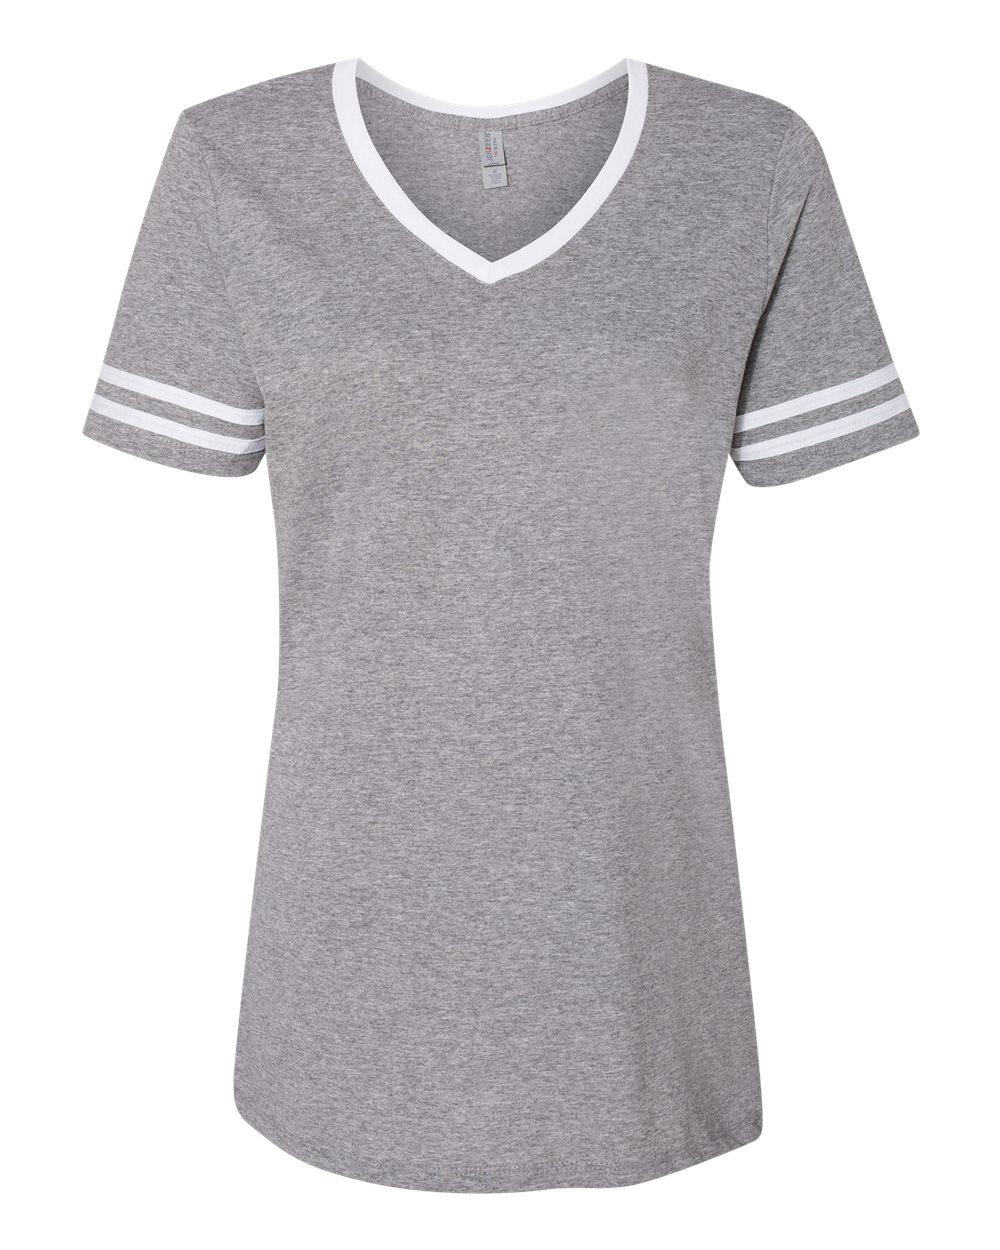 Jerzees-Triblend-Women-039-s-V-Neck-Varsity-T-Shirt-602WVR thumbnail 21